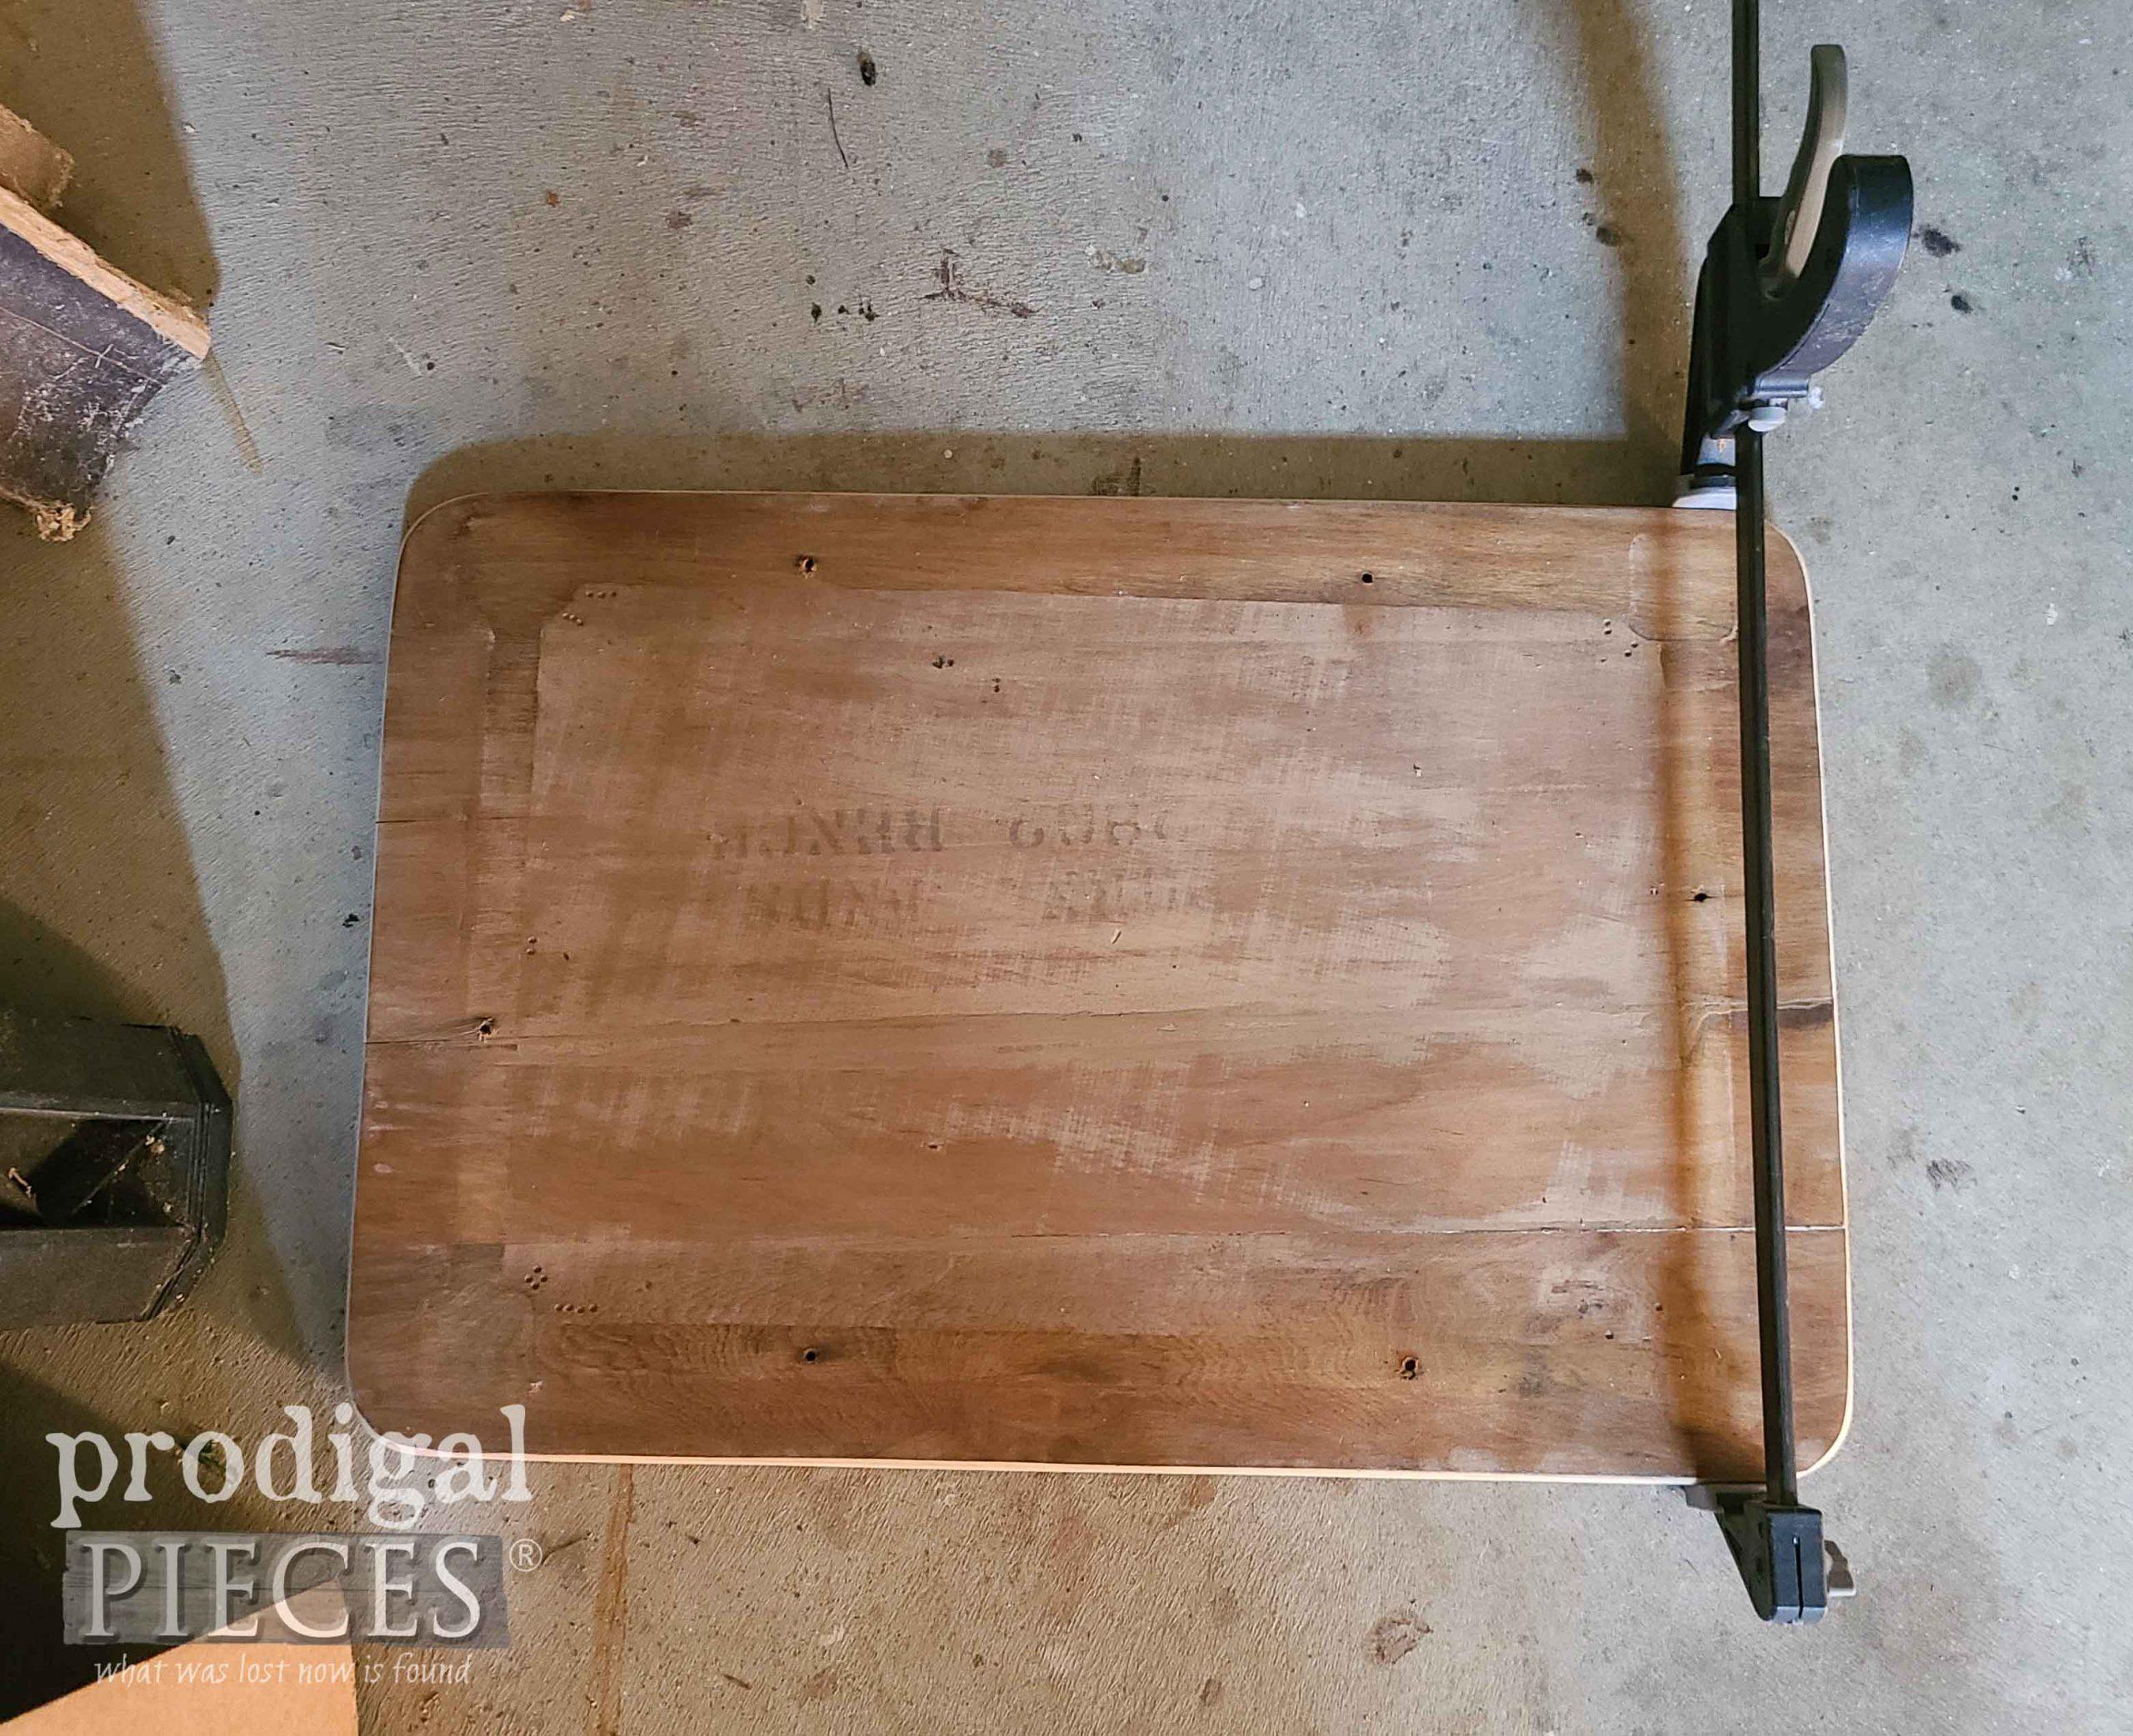 Gluing Mid Century Modern Bench Top | prodigalpieces.com